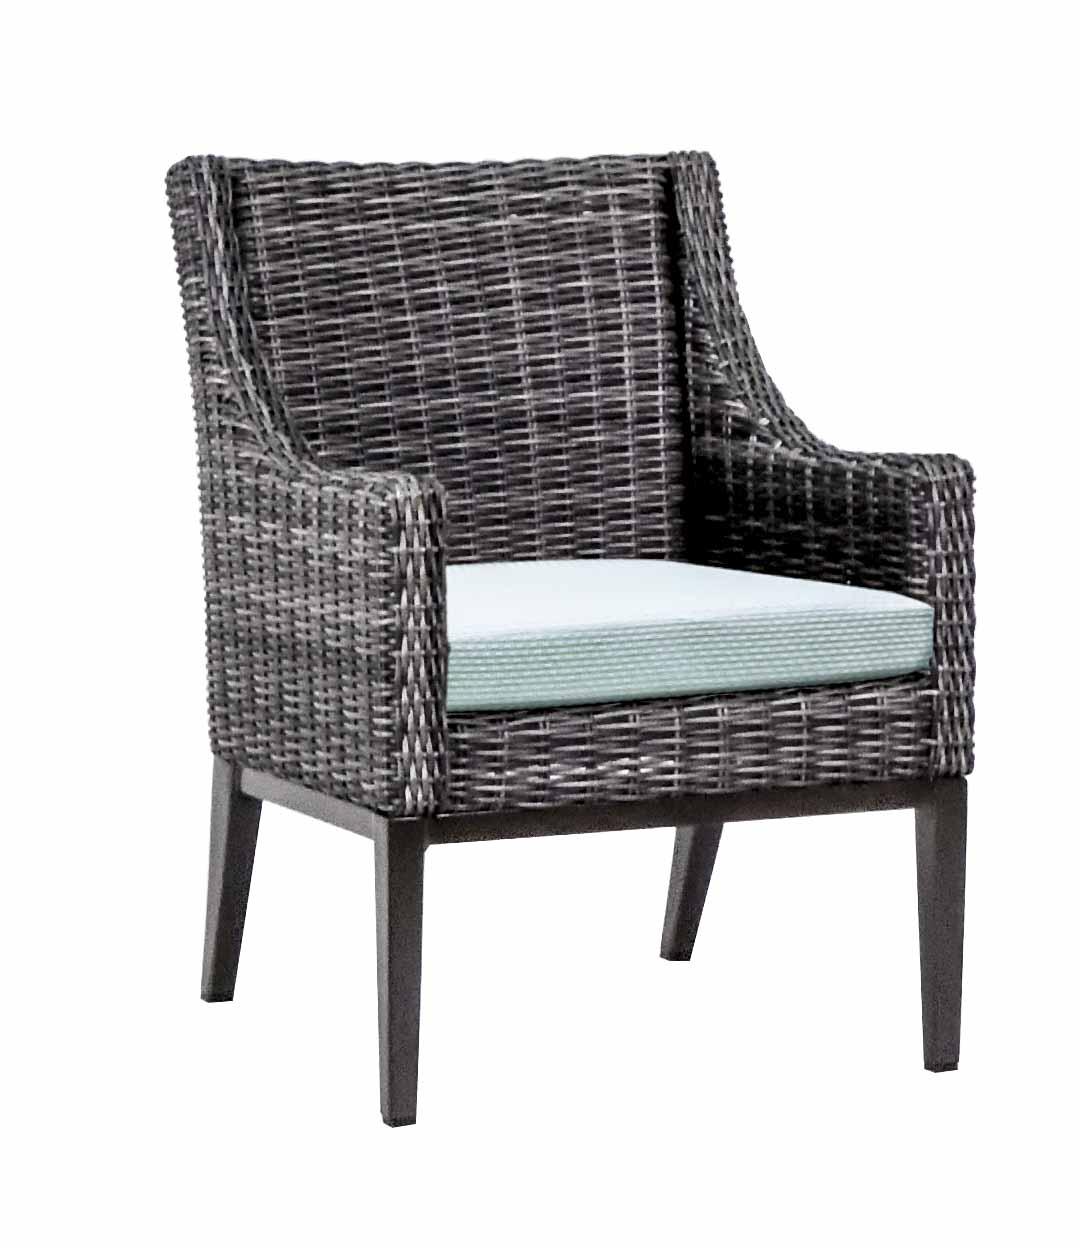 "976821 Somerset Dining Chair   25.6"" x 26.4"" x 36.1"""